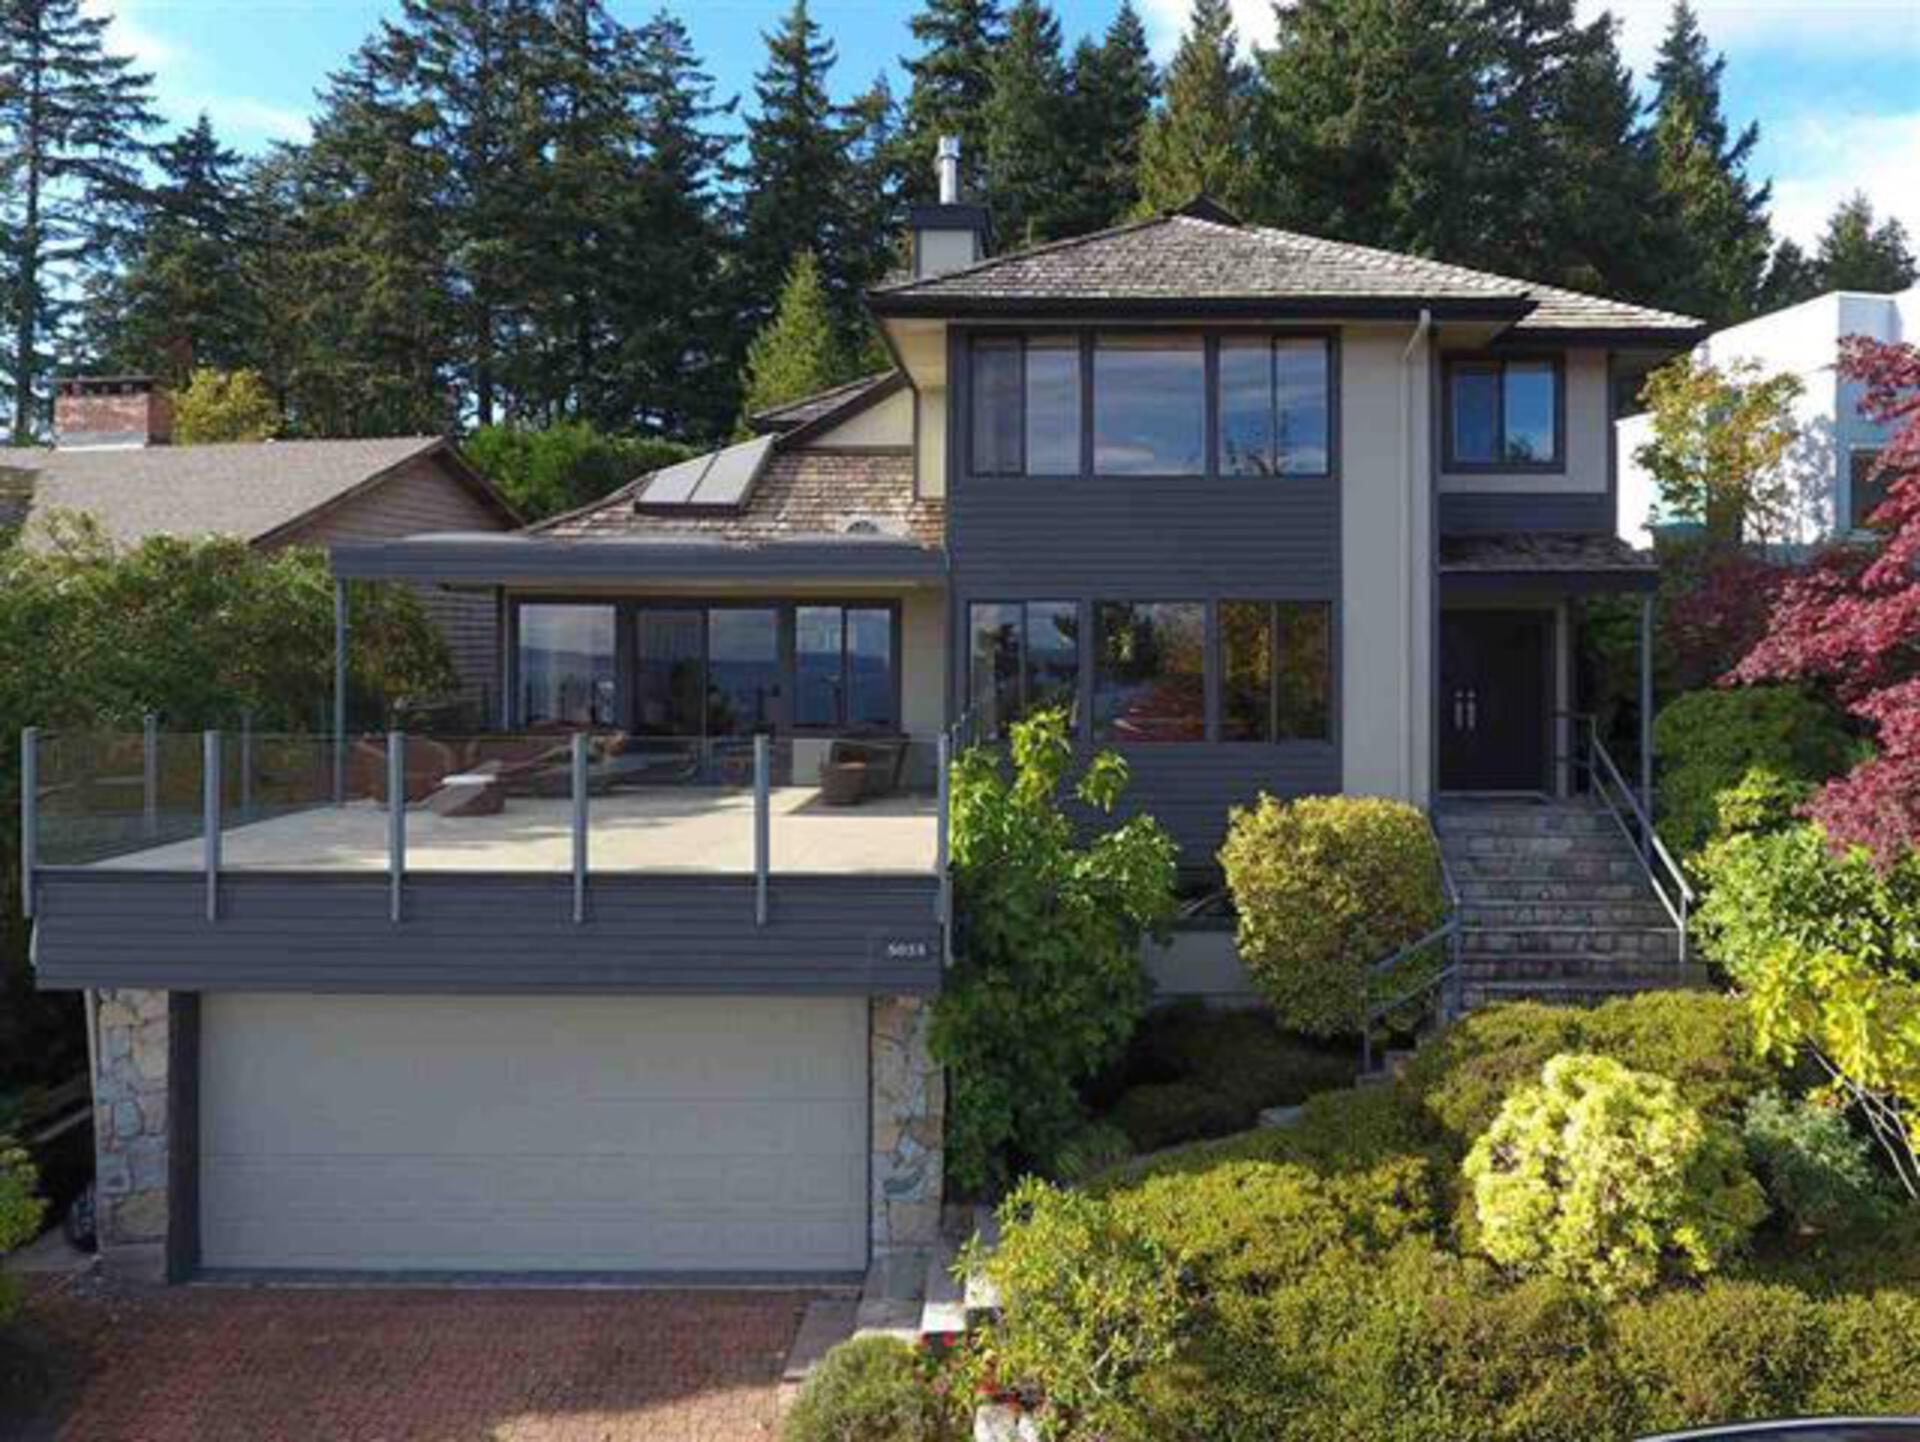 5033 Pinetree Crescent, Upper Caulfeild, West Vancouver